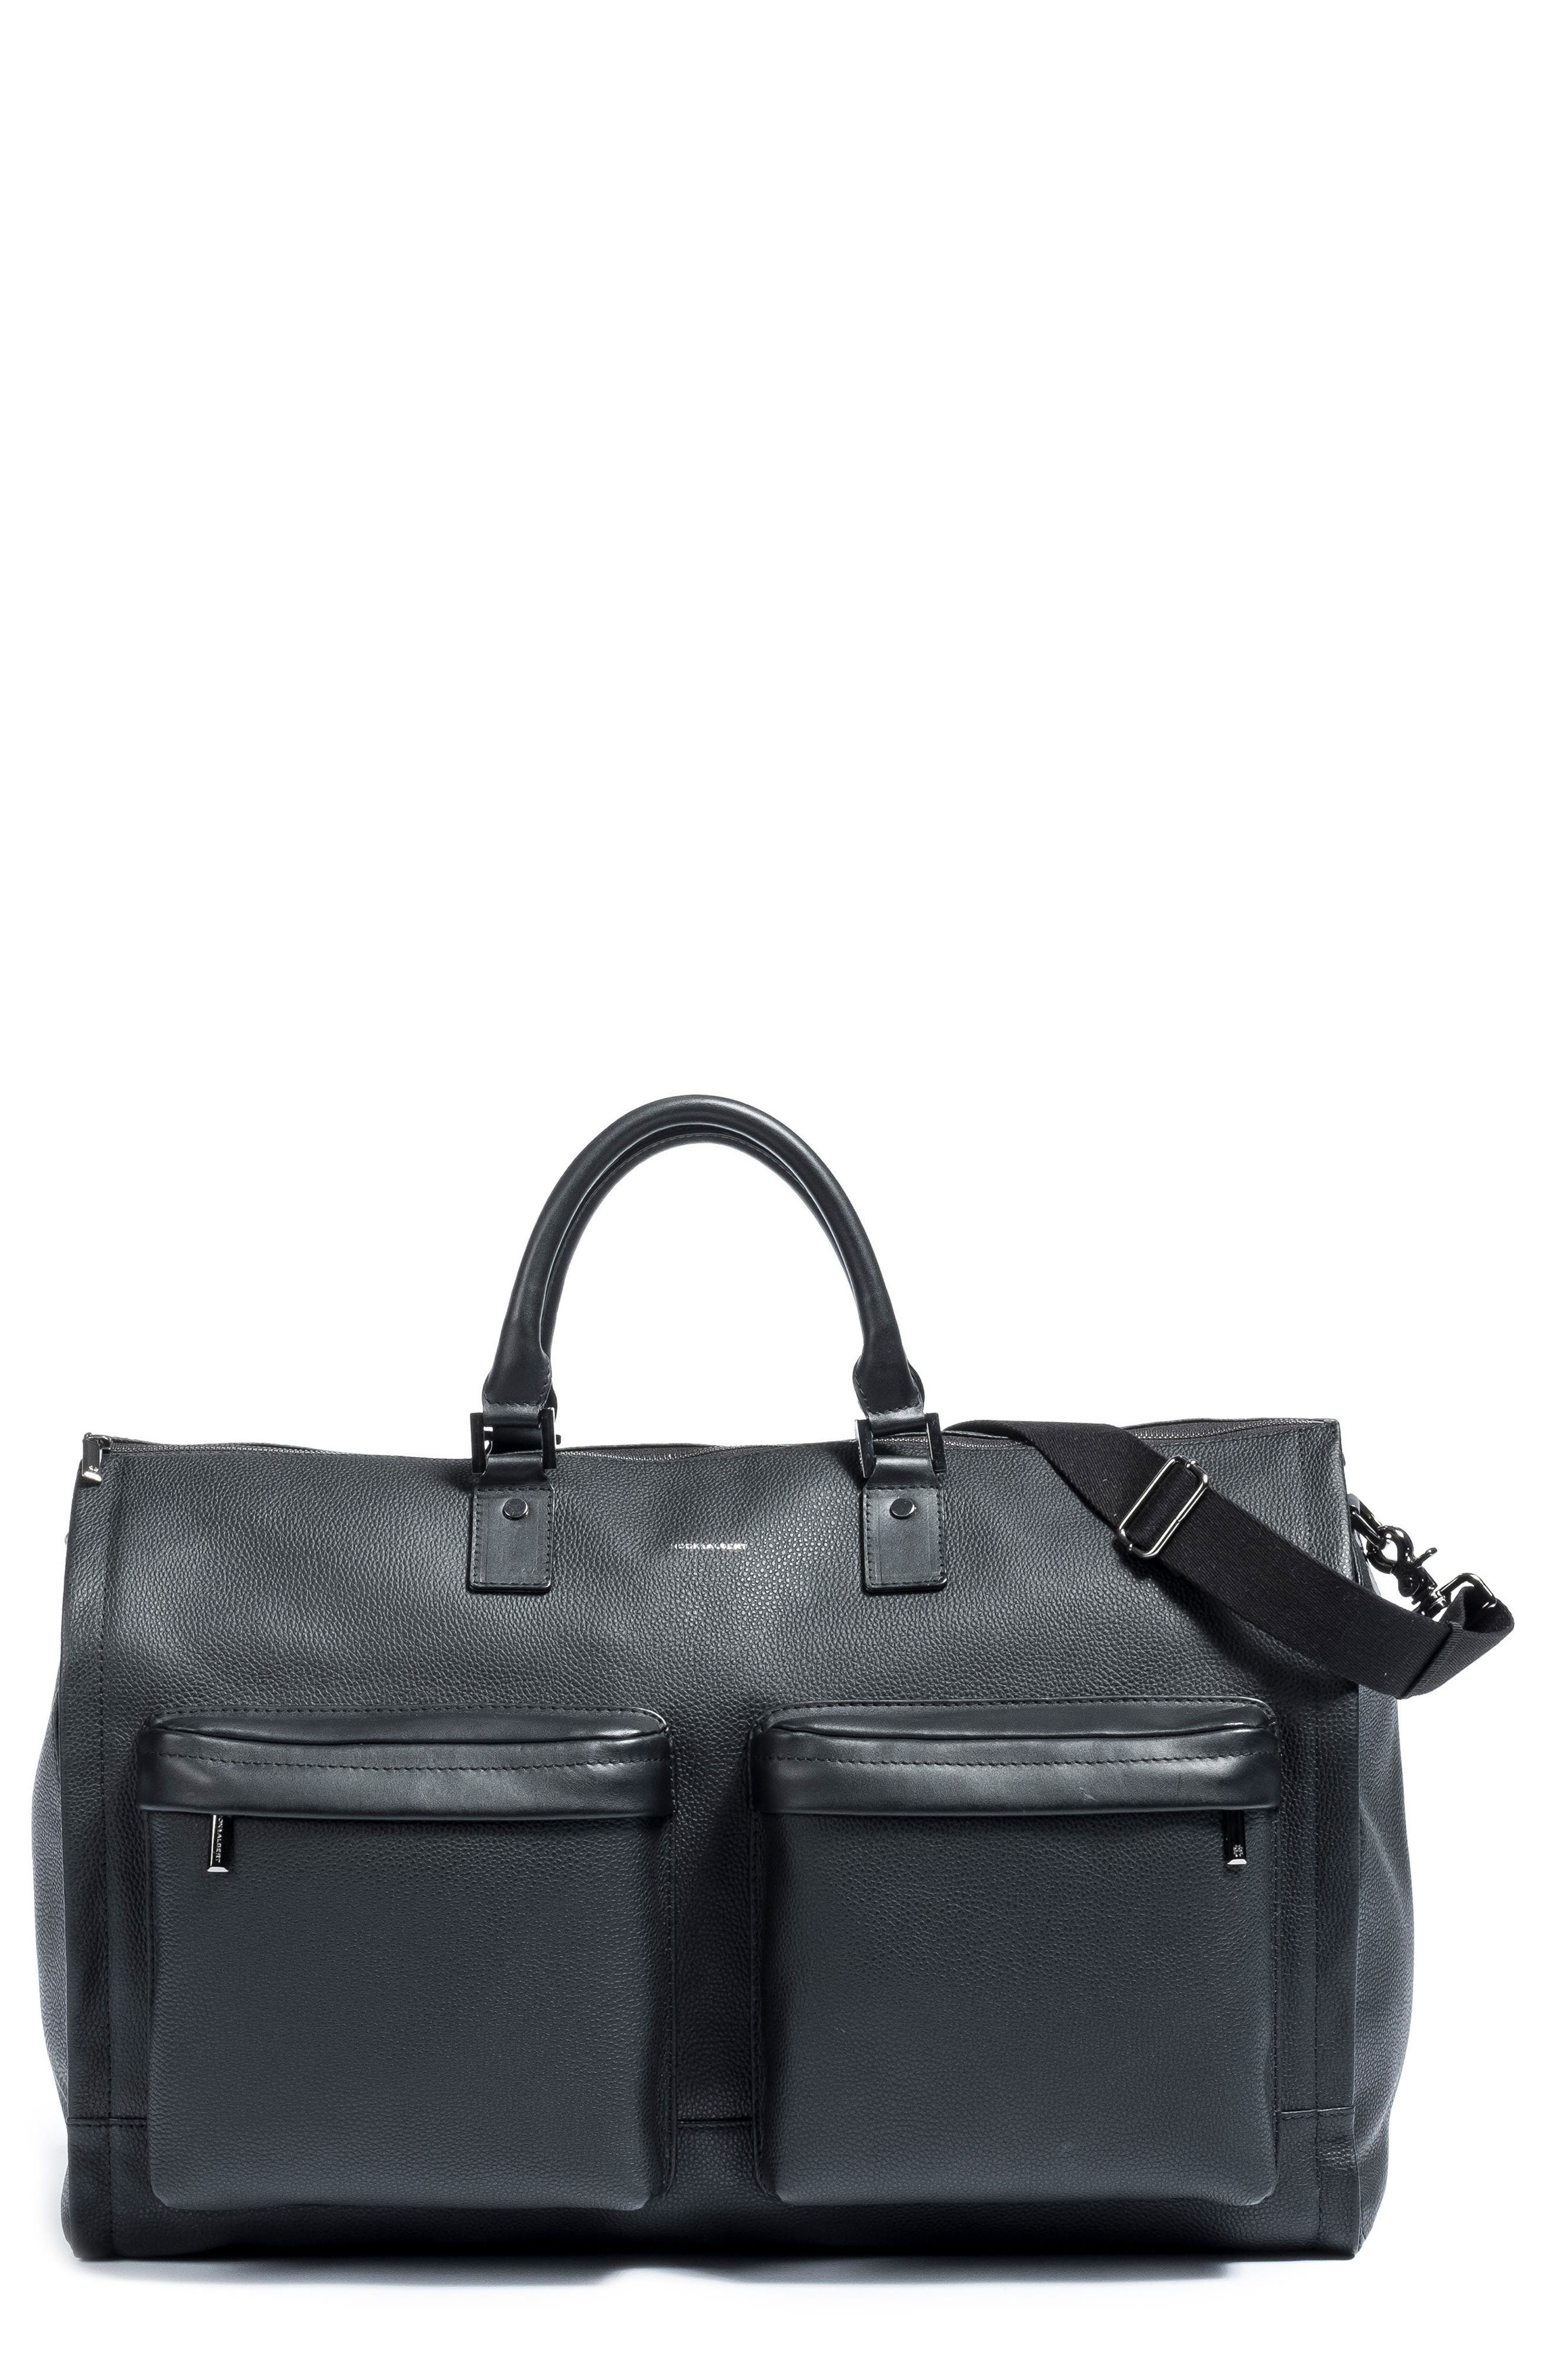 Leather Garment Bag,                             Main thumbnail 1, color,                             BLACK